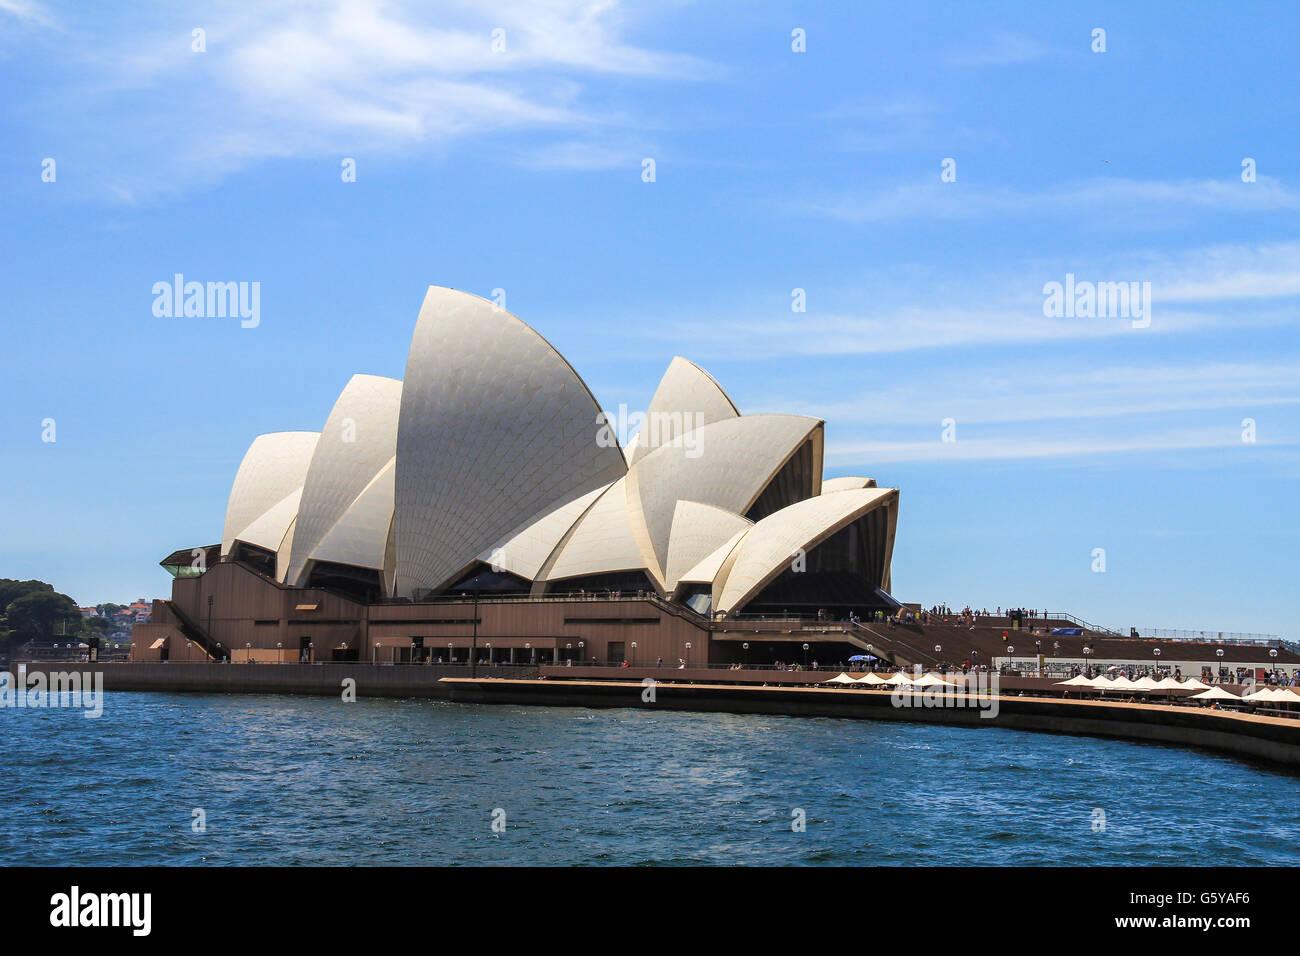 Sydney Opera house in Australia - Stock Image